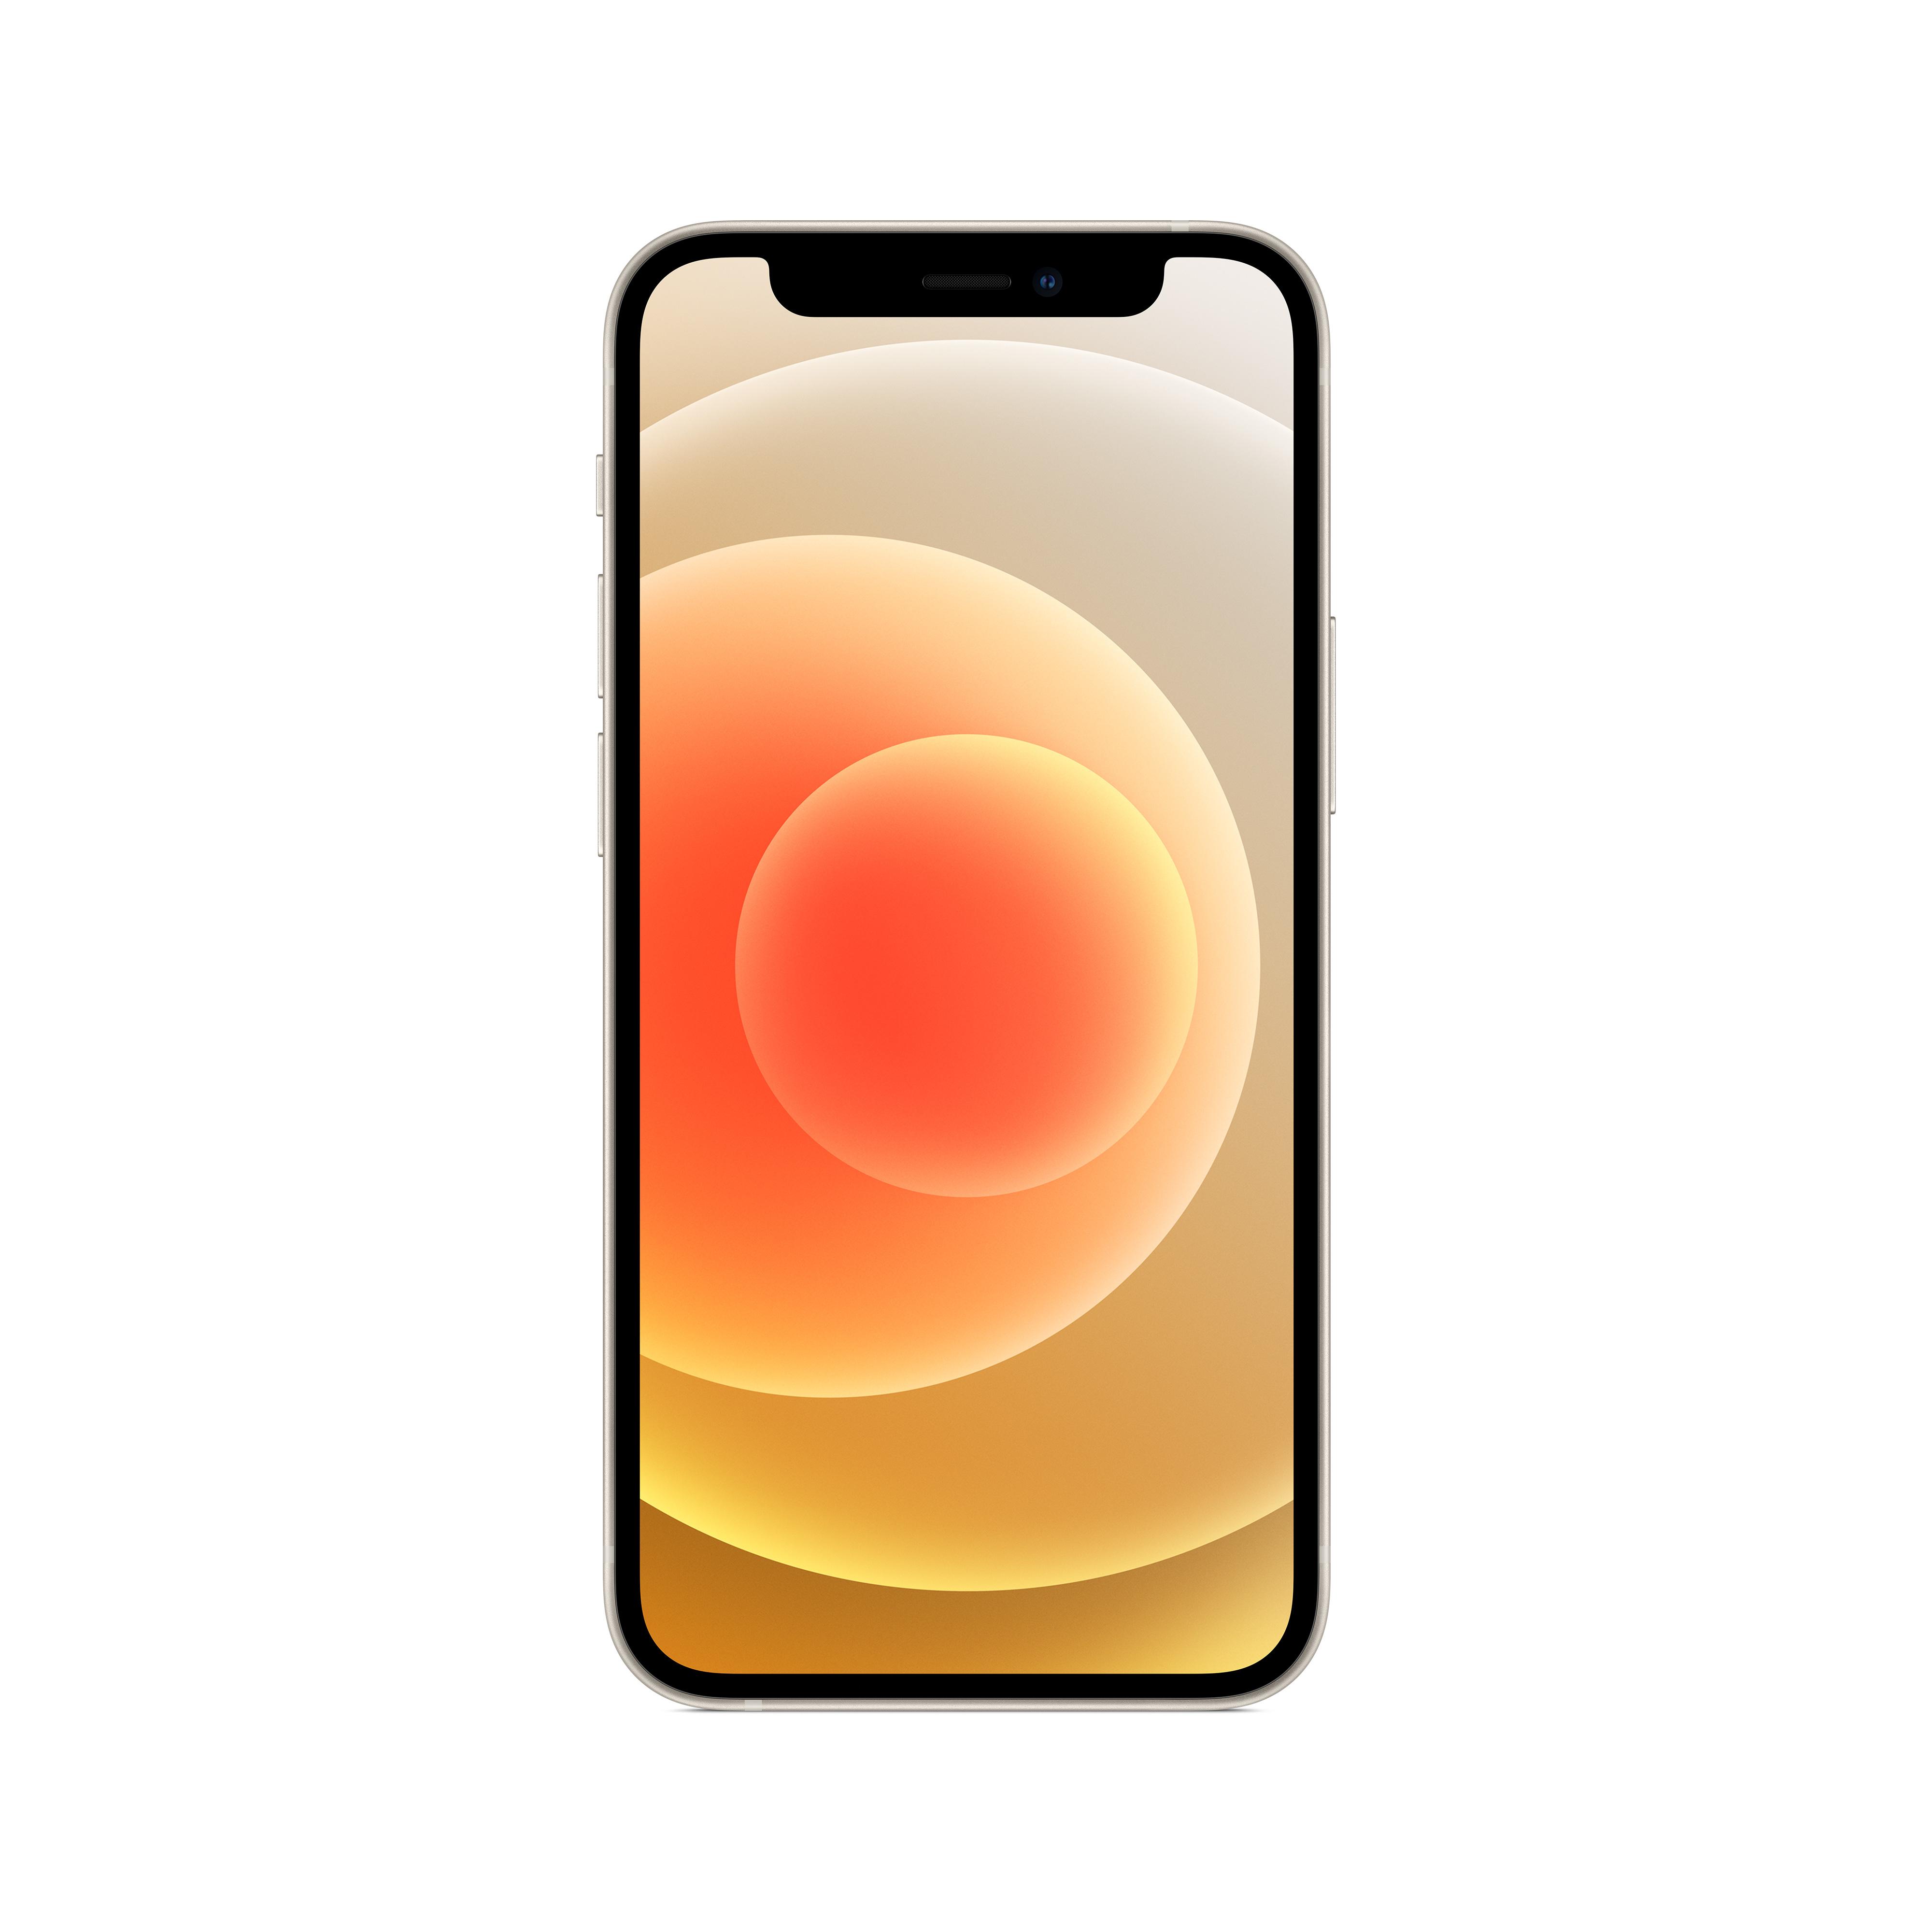 Apple - iPhone 12 Mini 128gb White